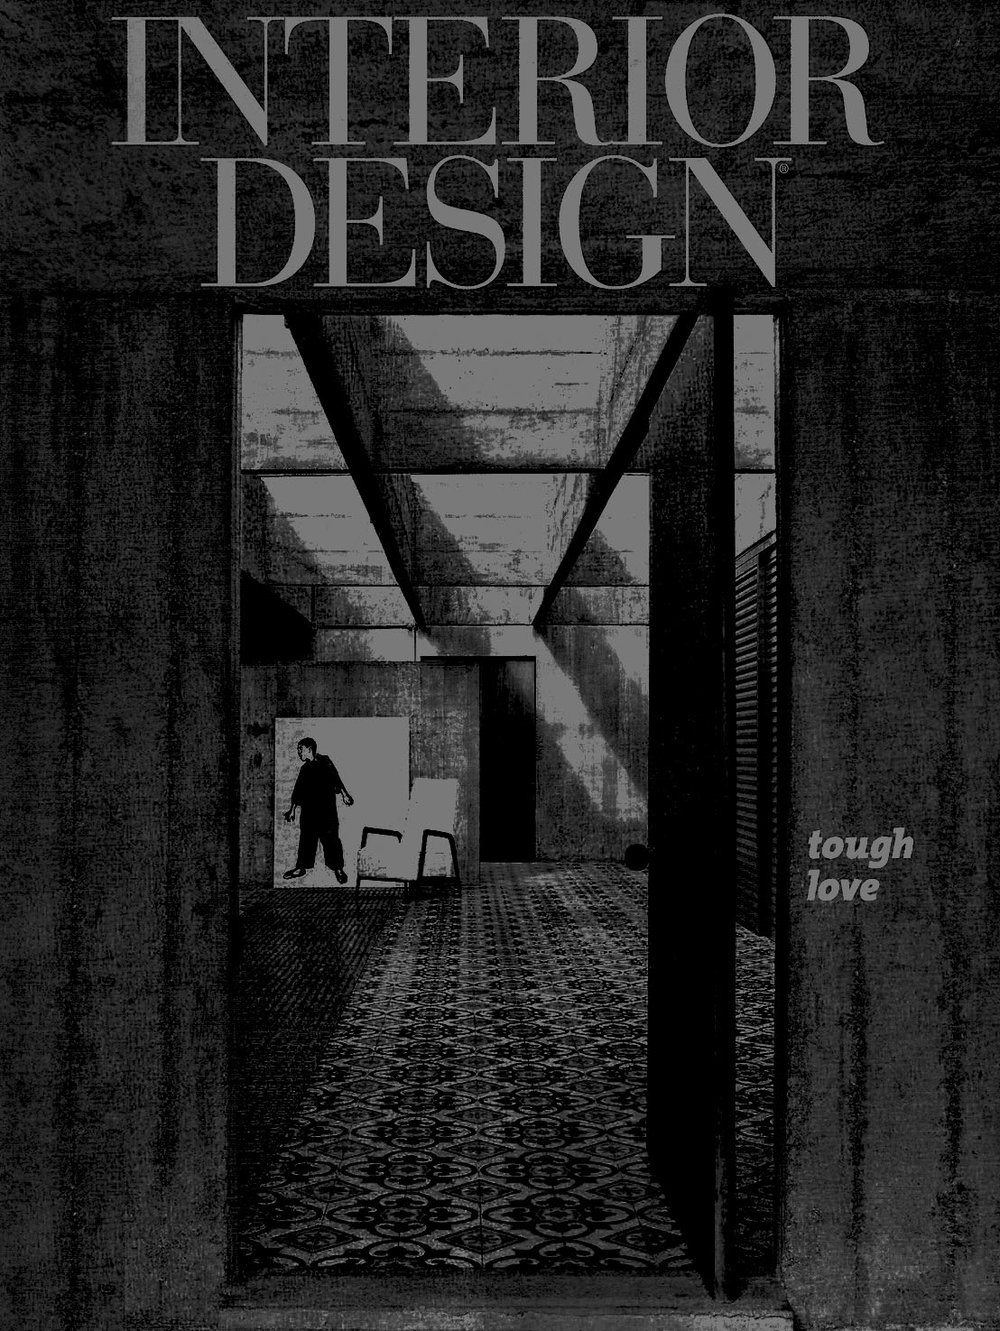 Award Winning Hospitality Design Firm in New York, NY | Joe Ginsberg Design